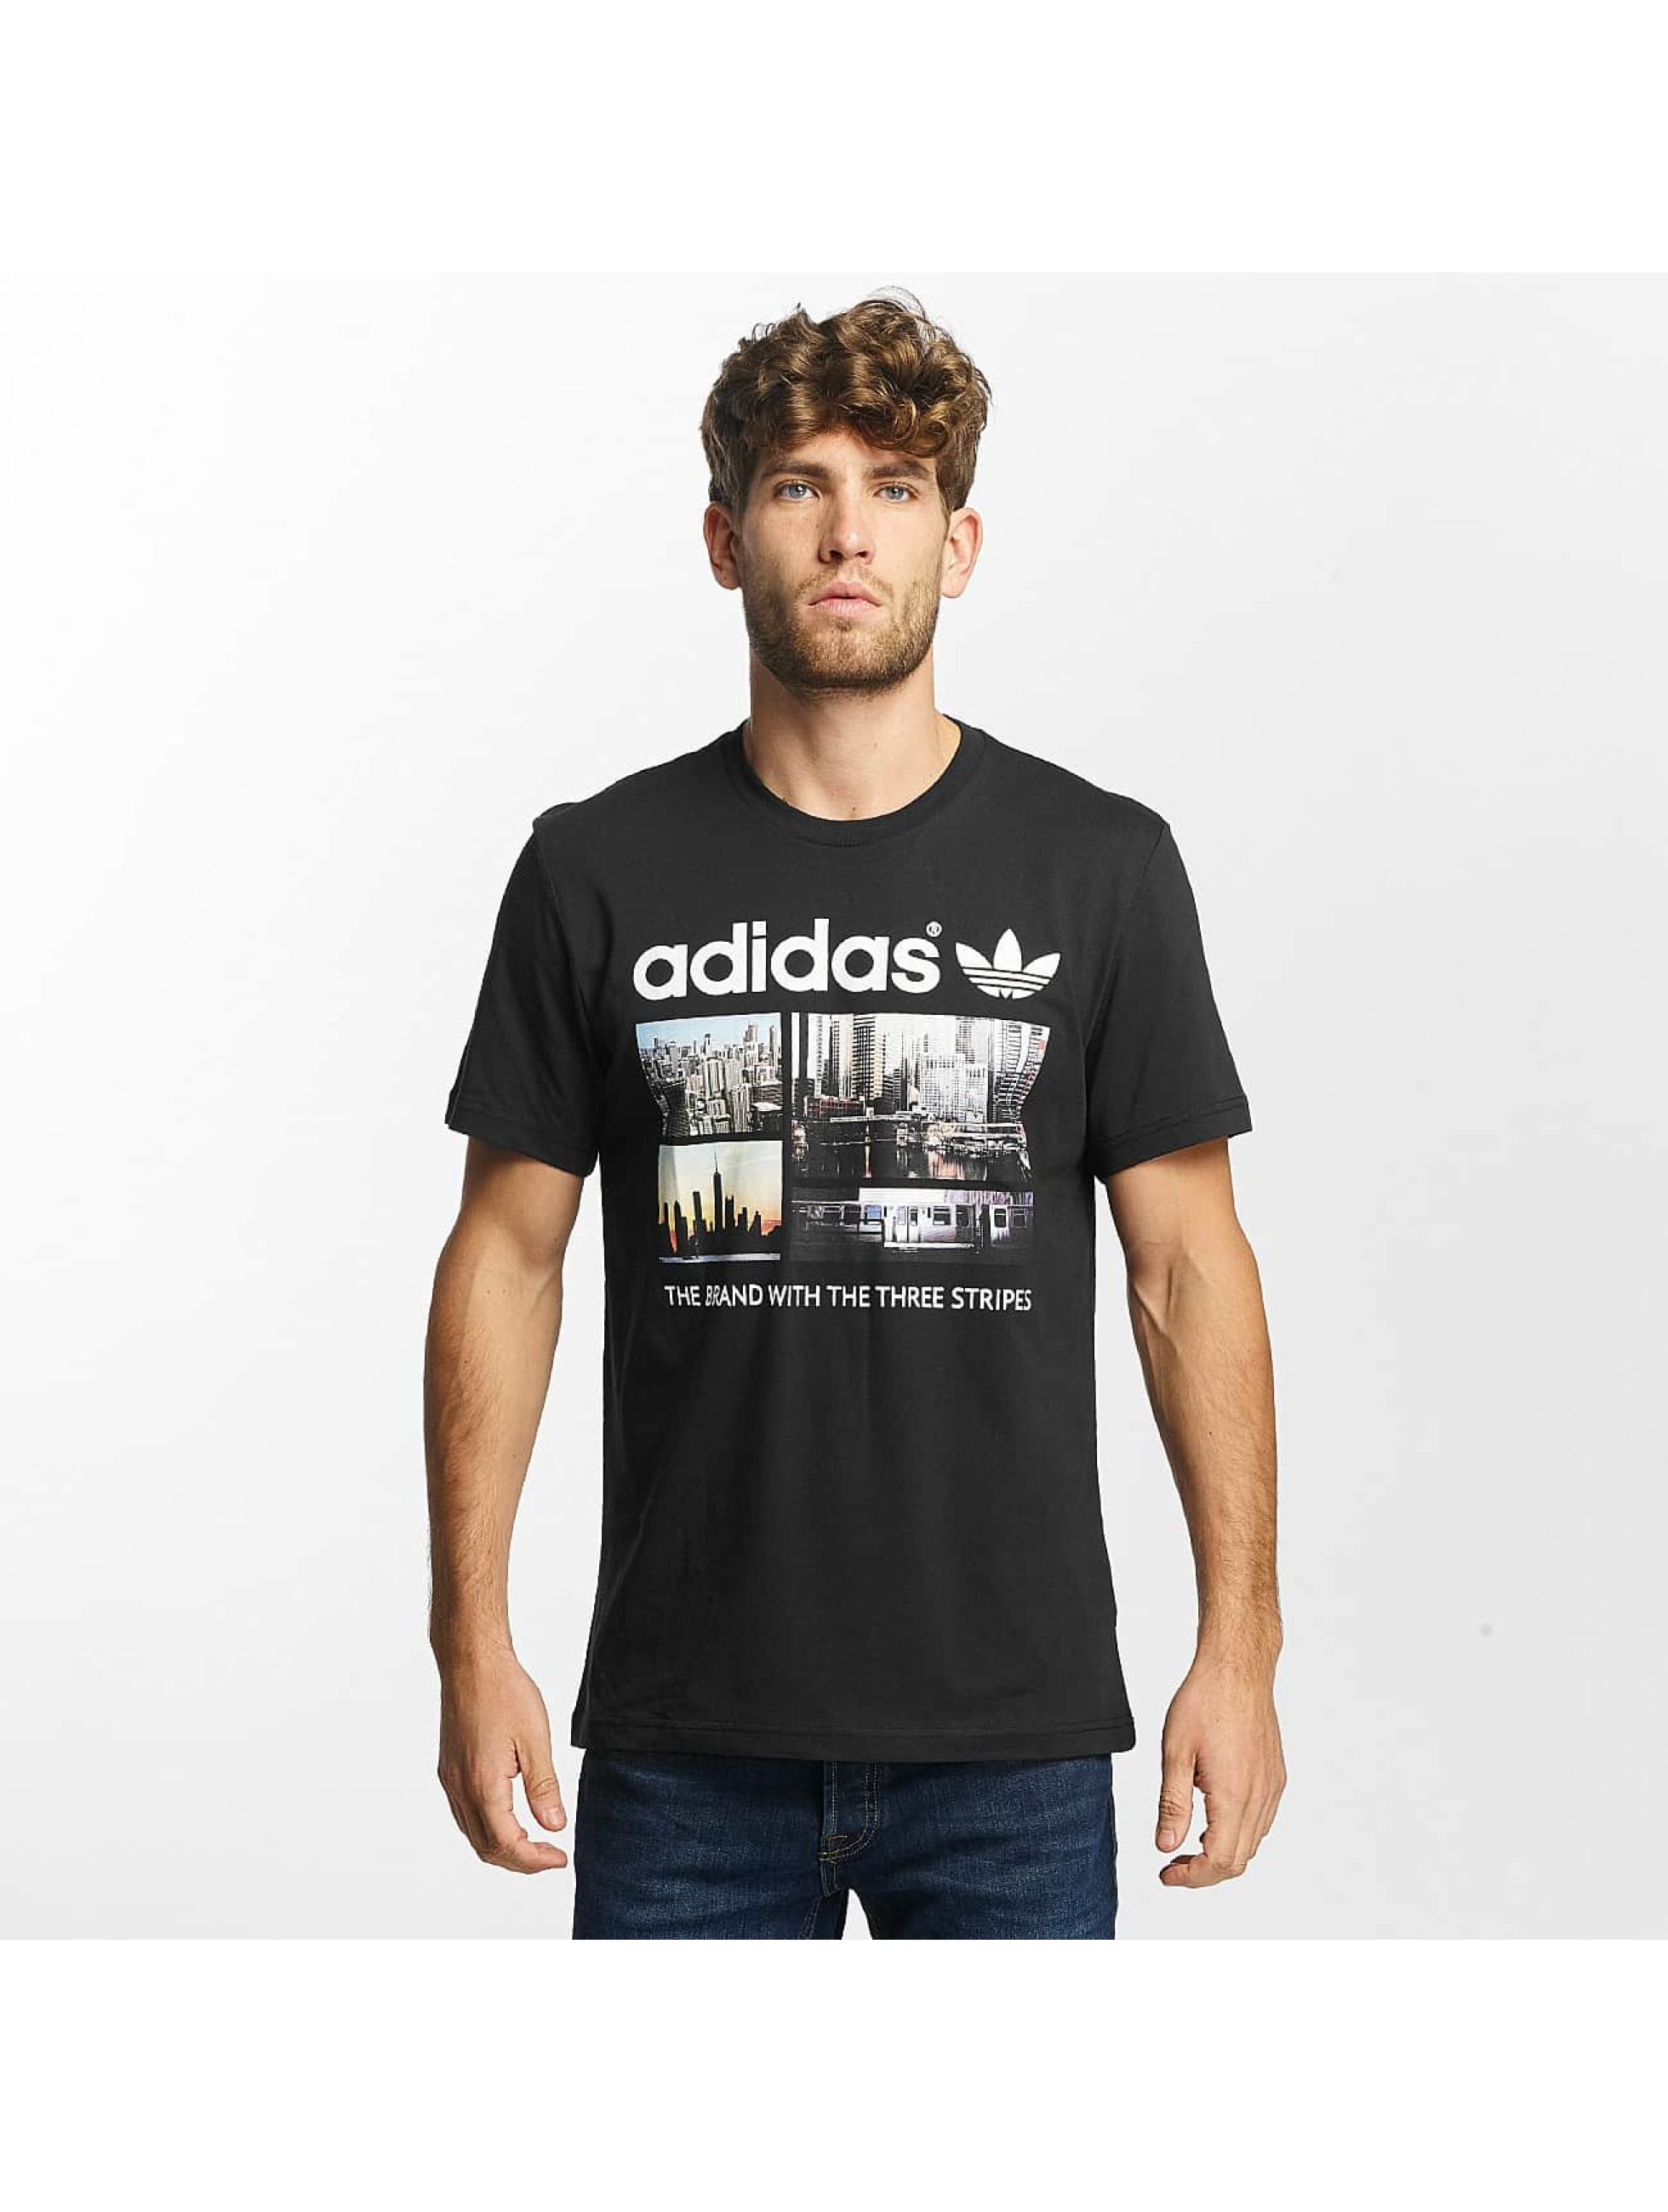 adidas T-Shirt Photo 1 schwarz